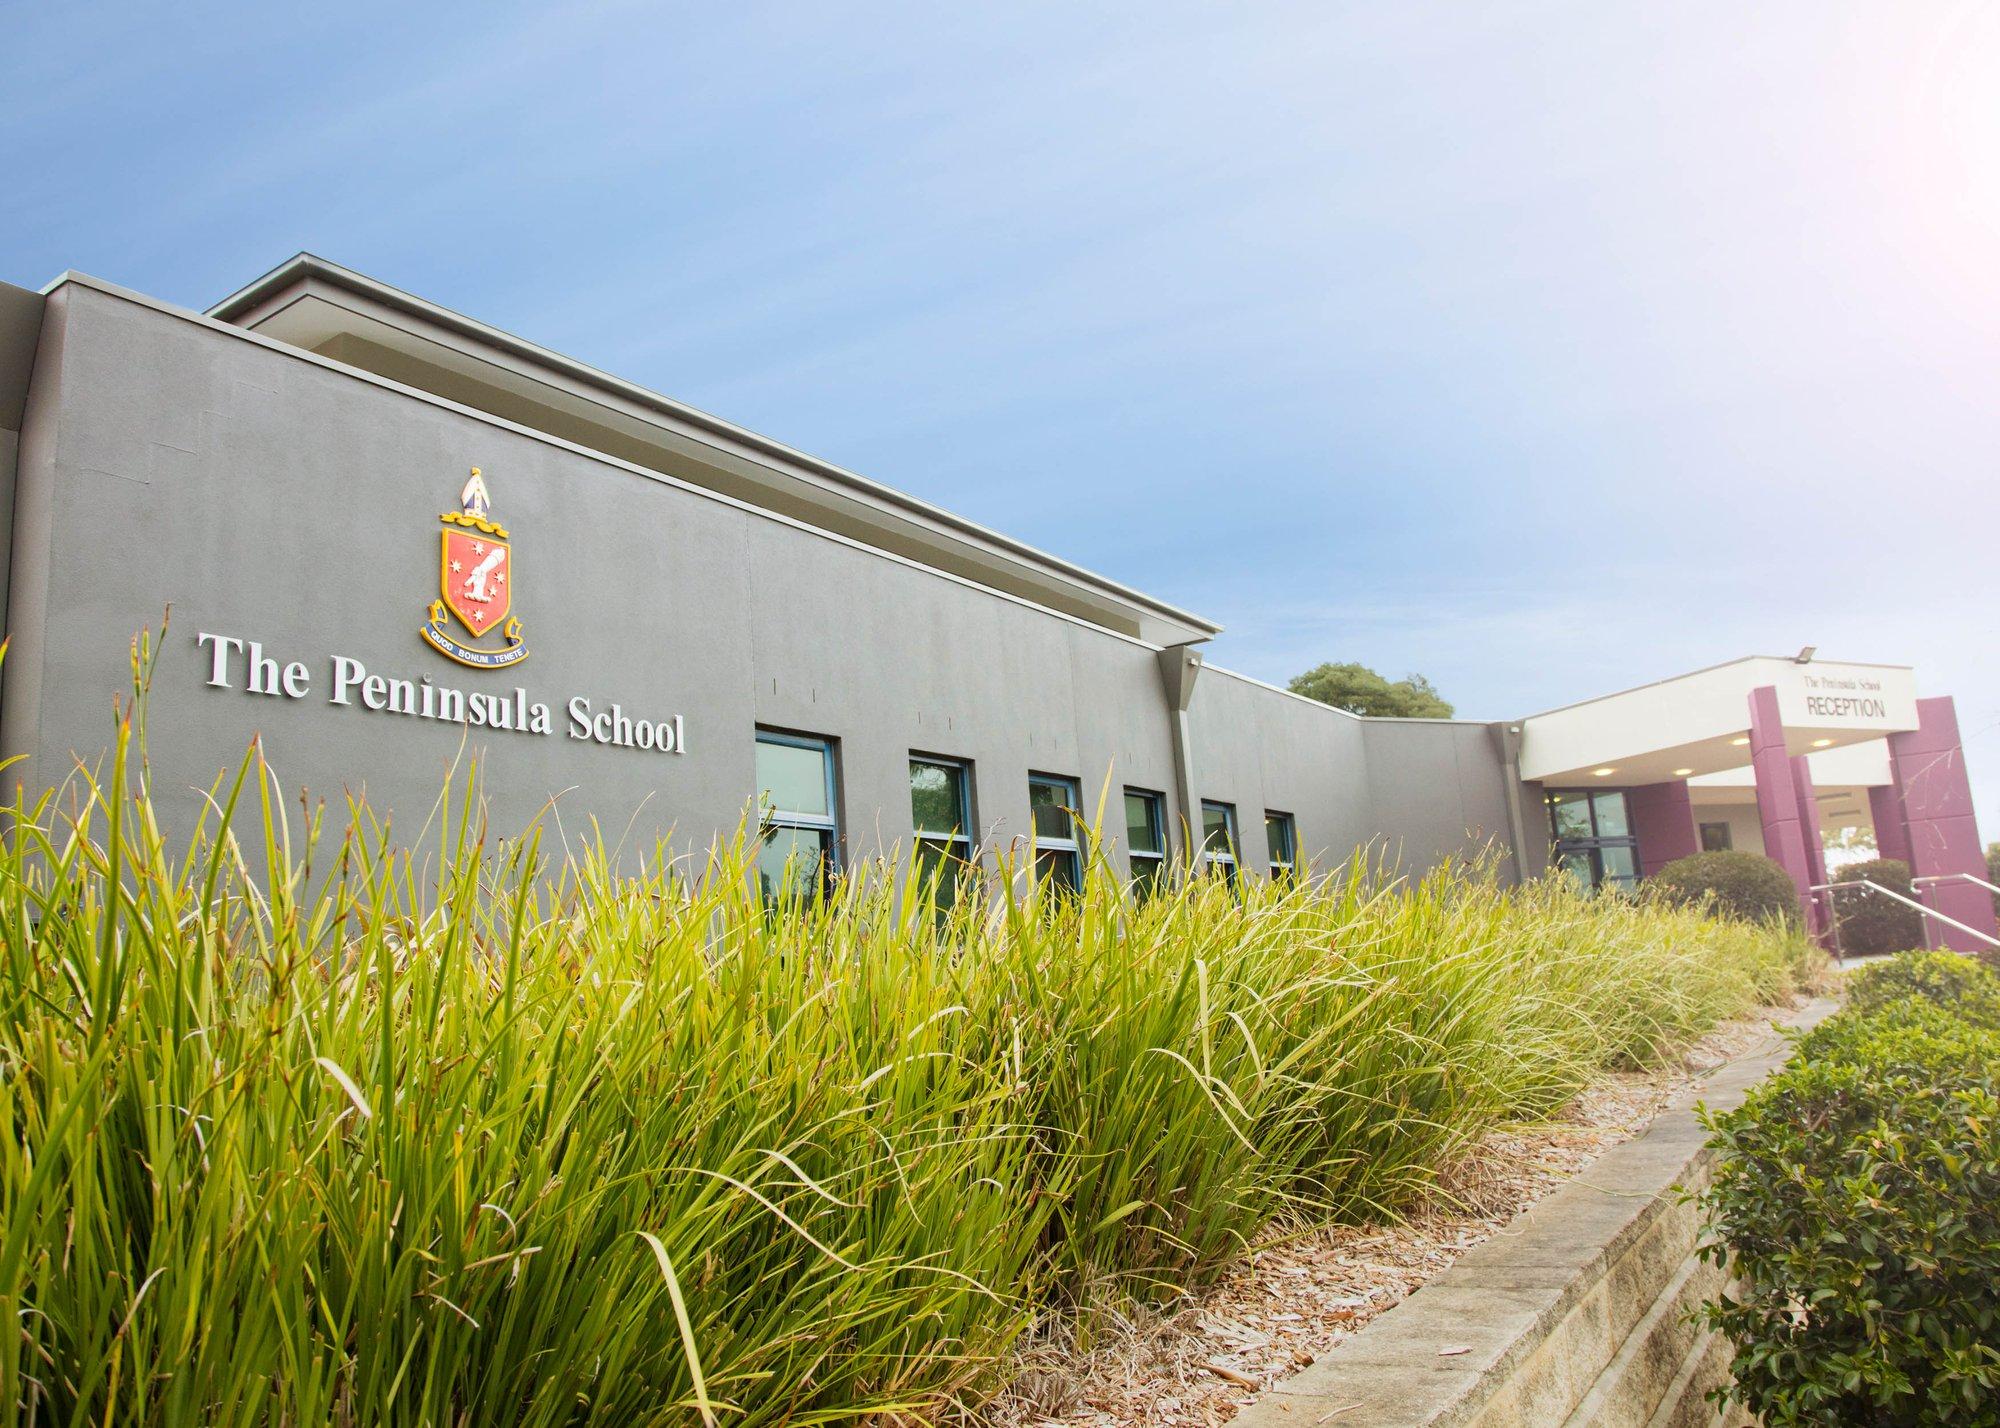 School maintenance Melbourne - The Peninsula School After